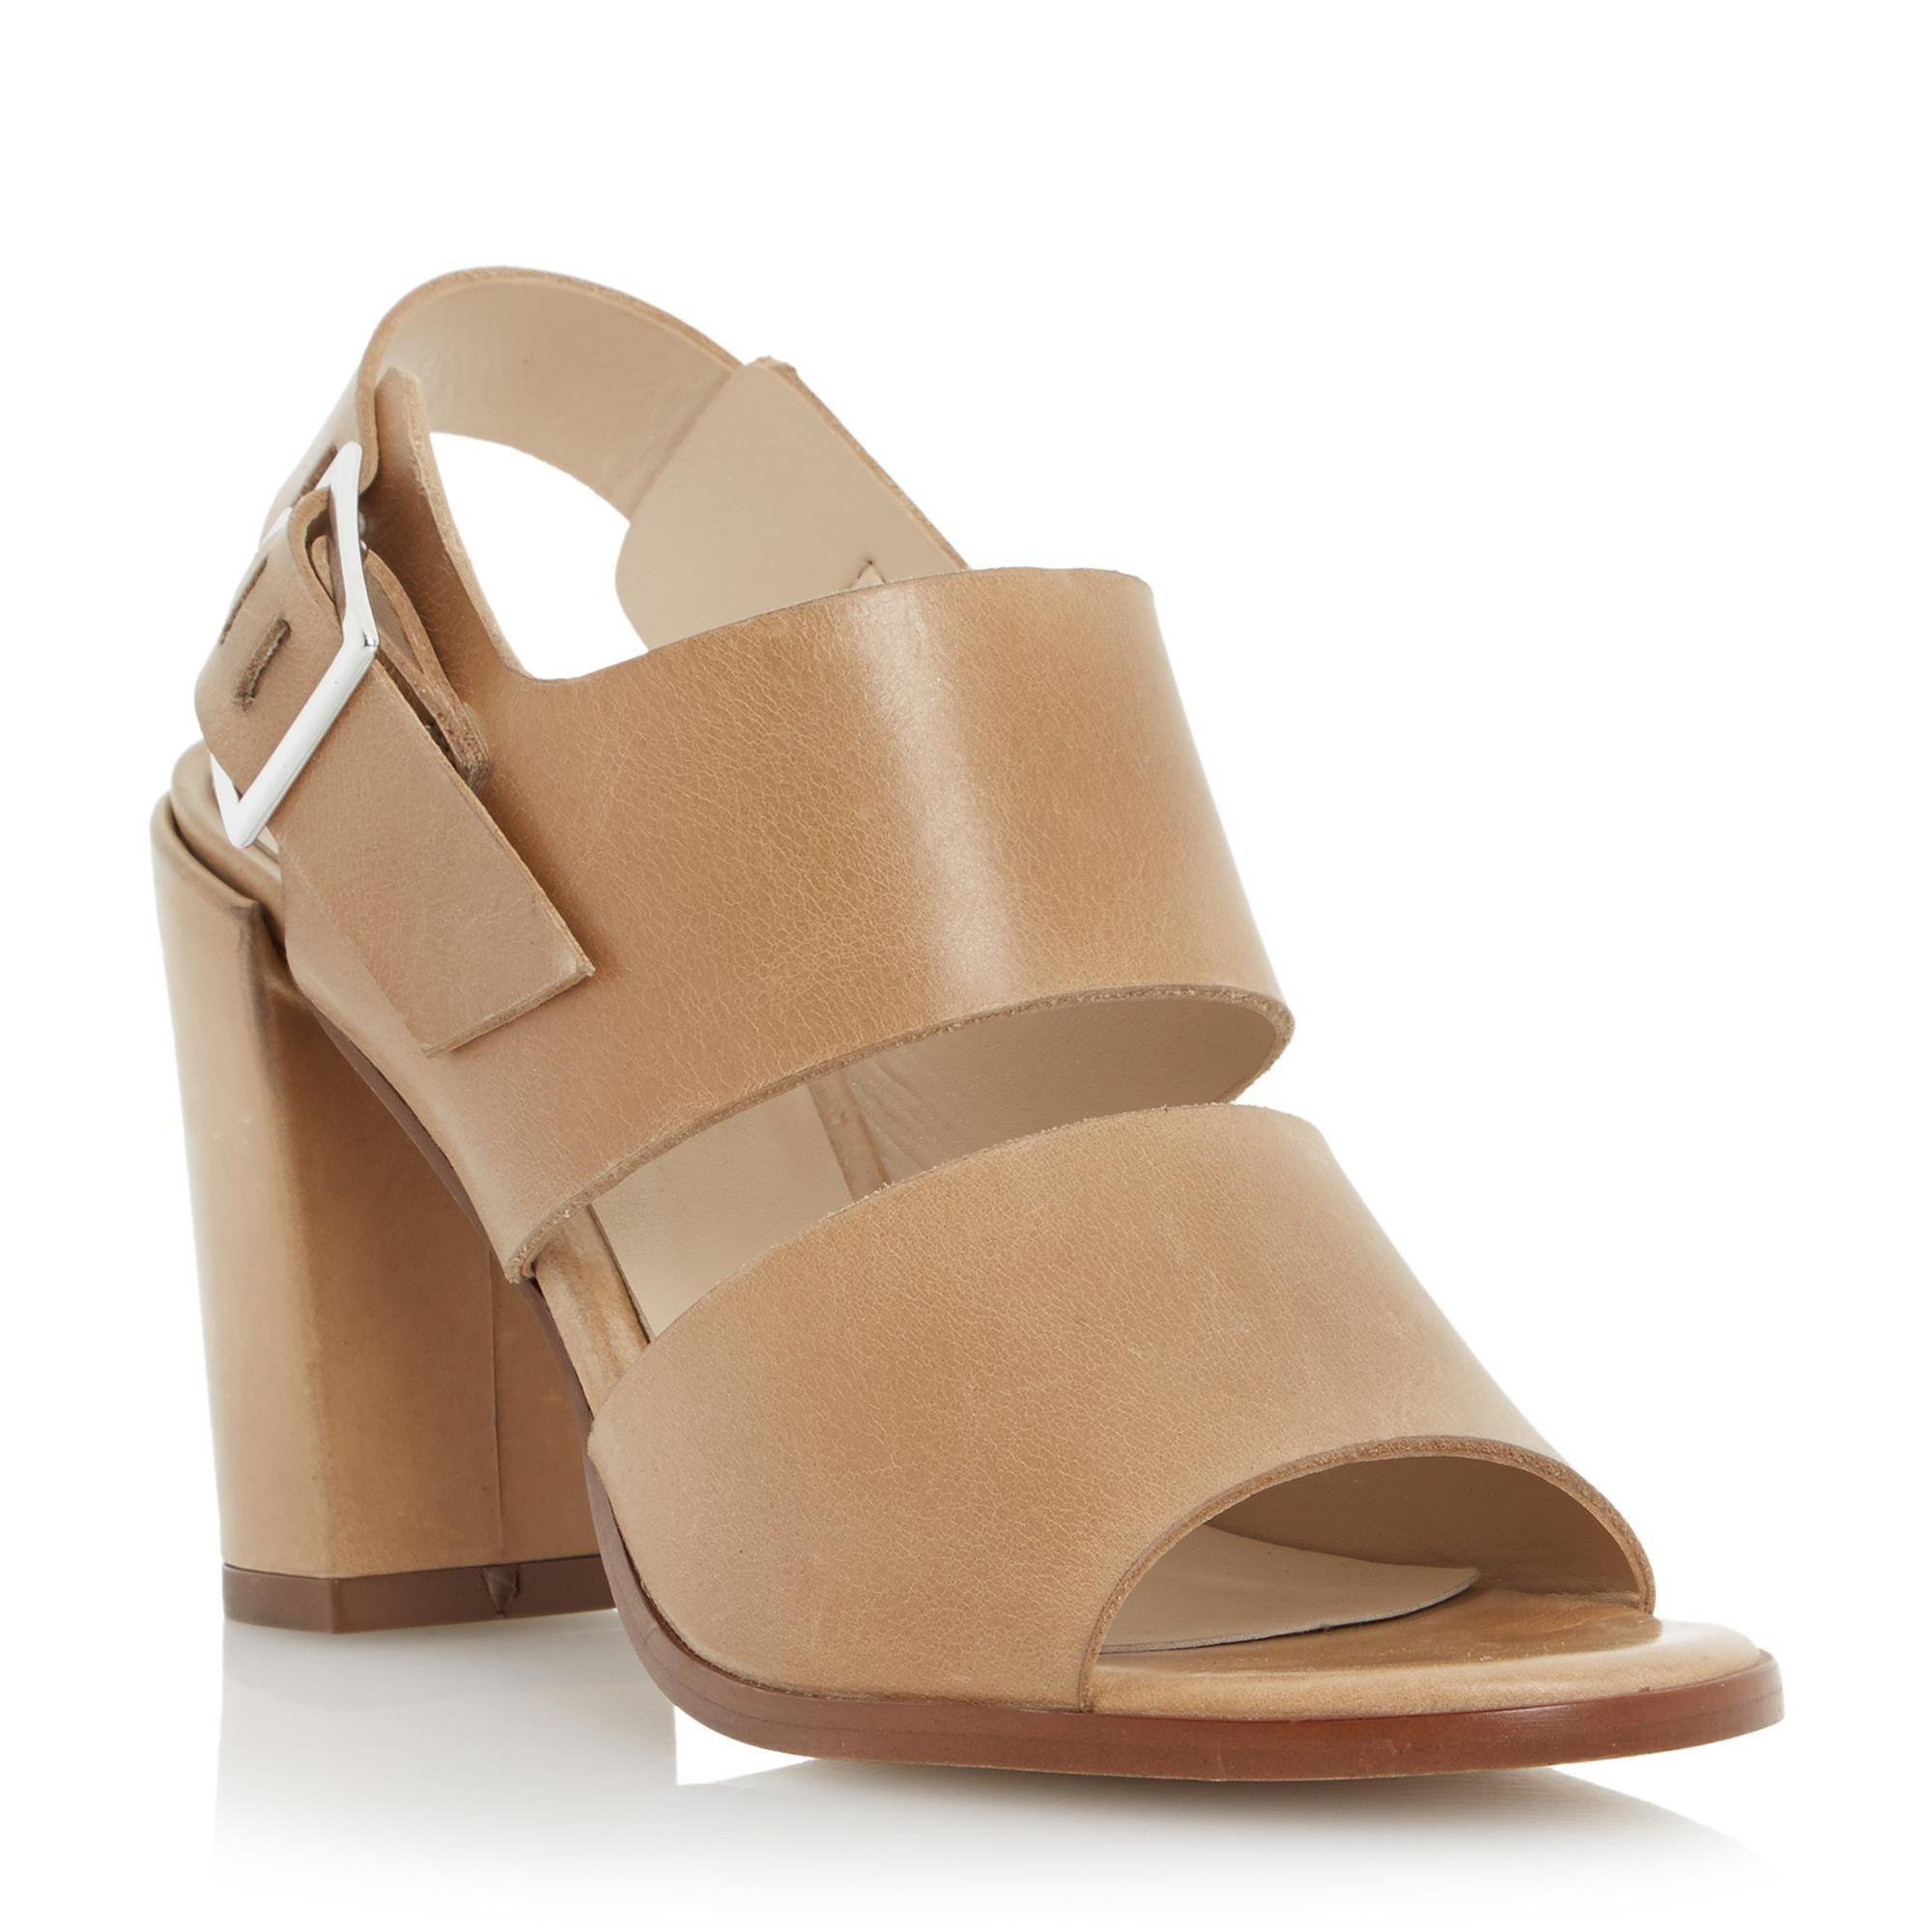 93947625eb1 DUNE LADIES JAMEY - Front Strap Block Heel Sandal - nude